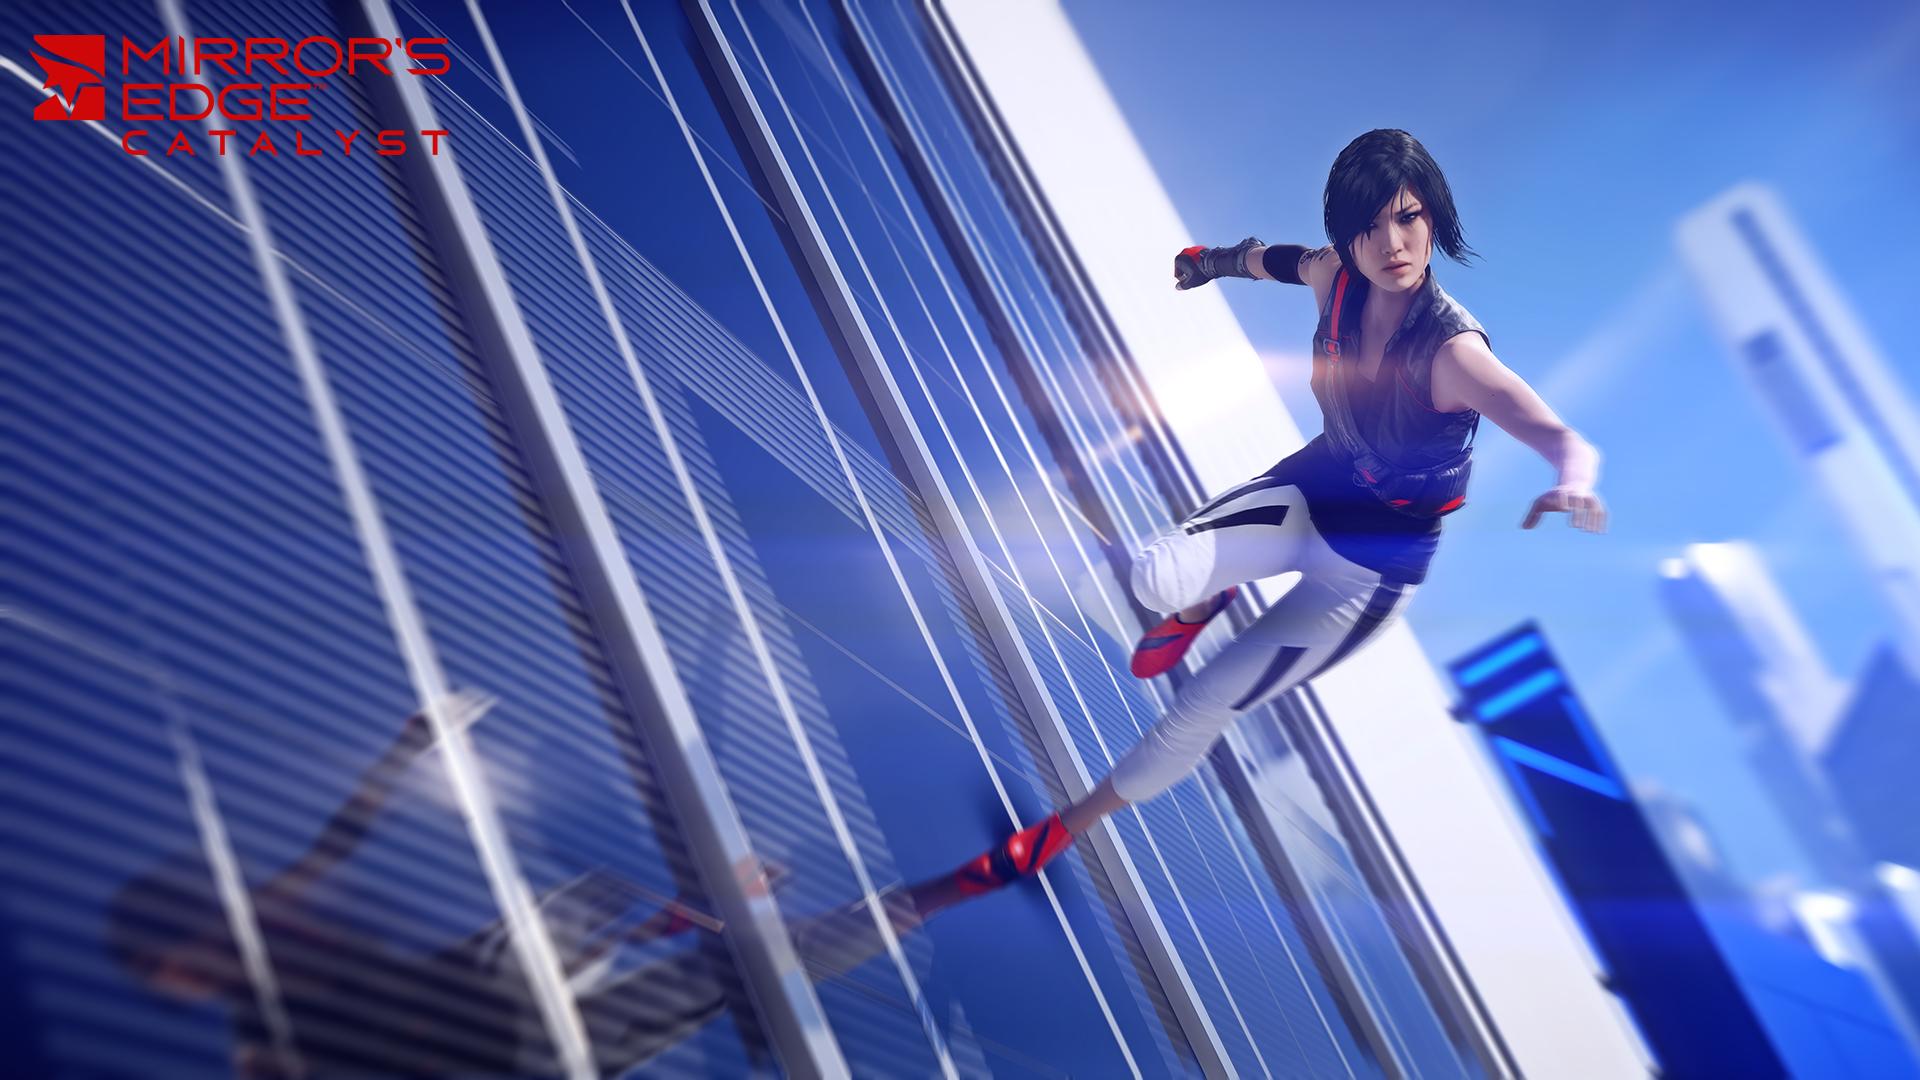 Mirror's Edge PC Latest Version Free Download